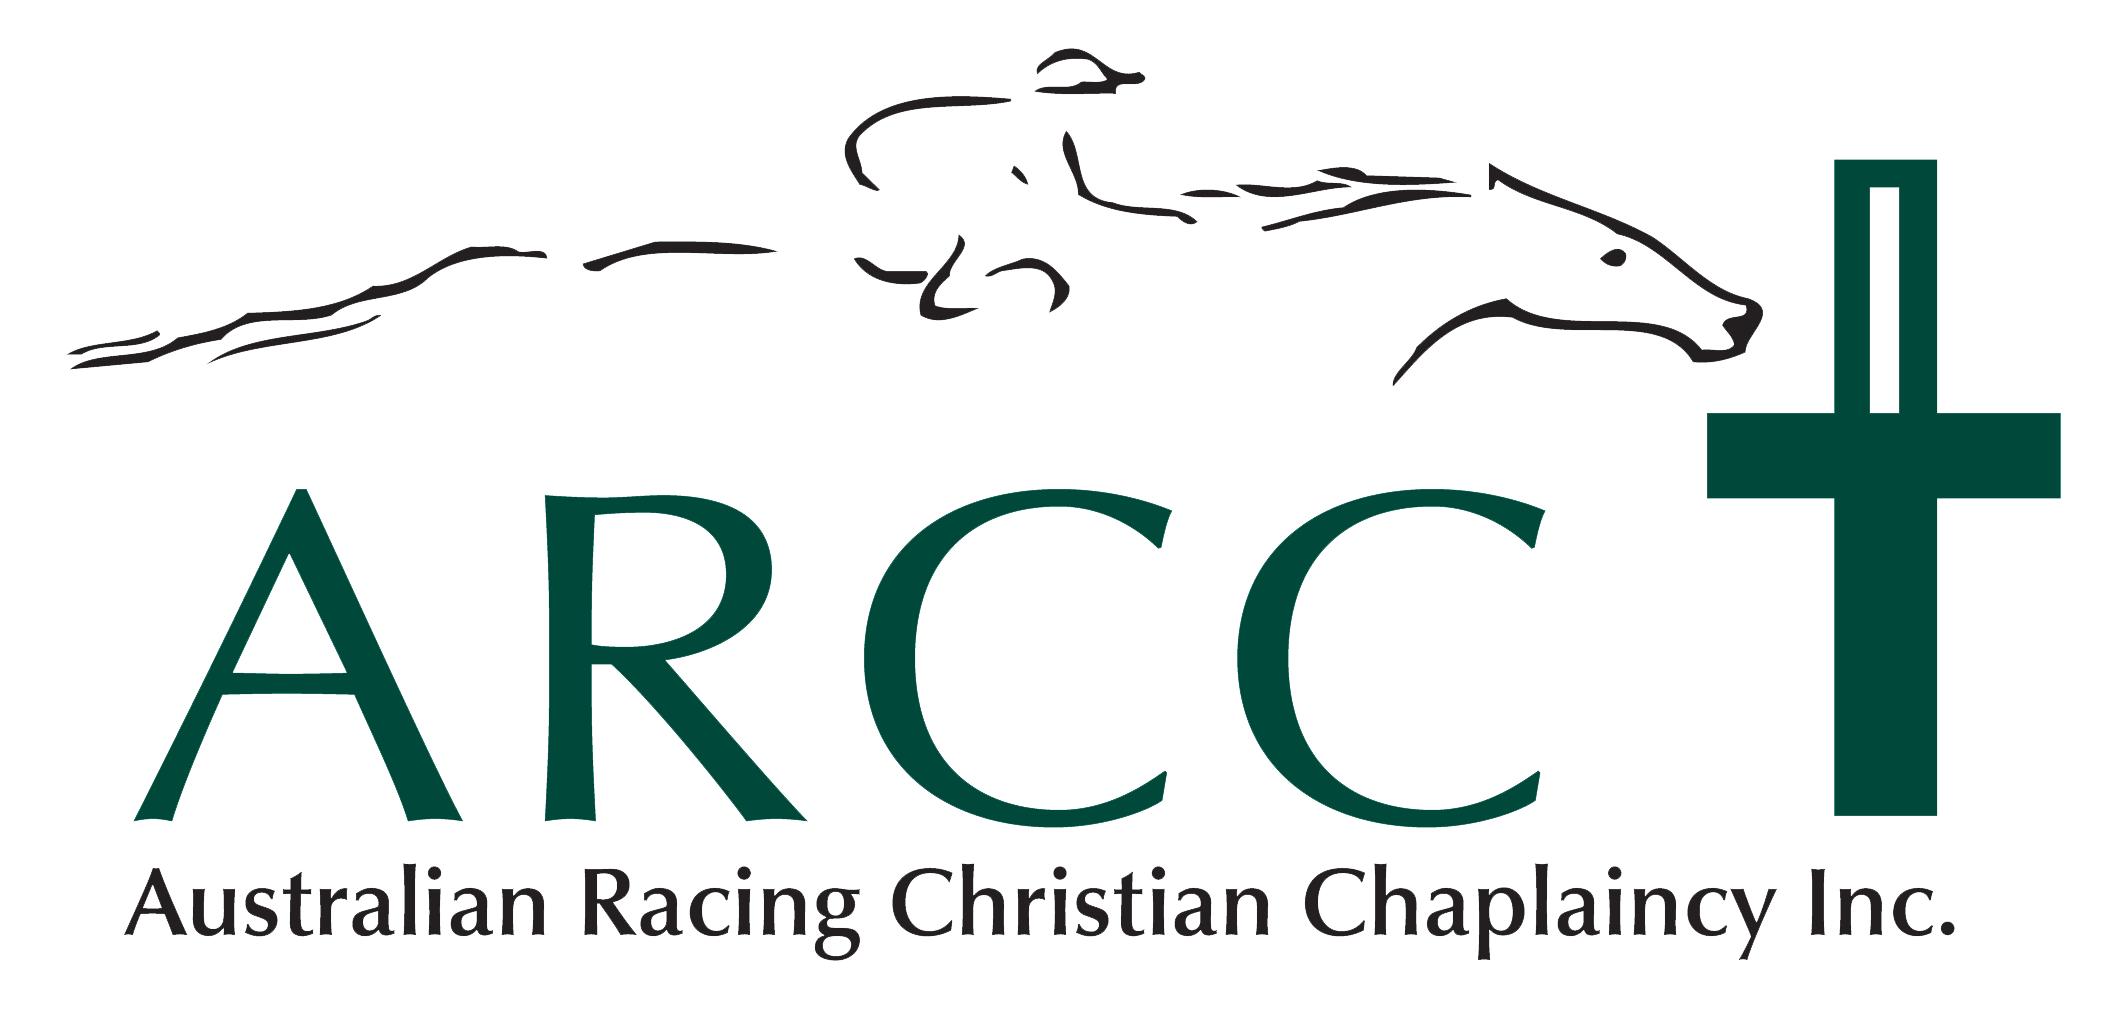 ARCC_logo.EPS